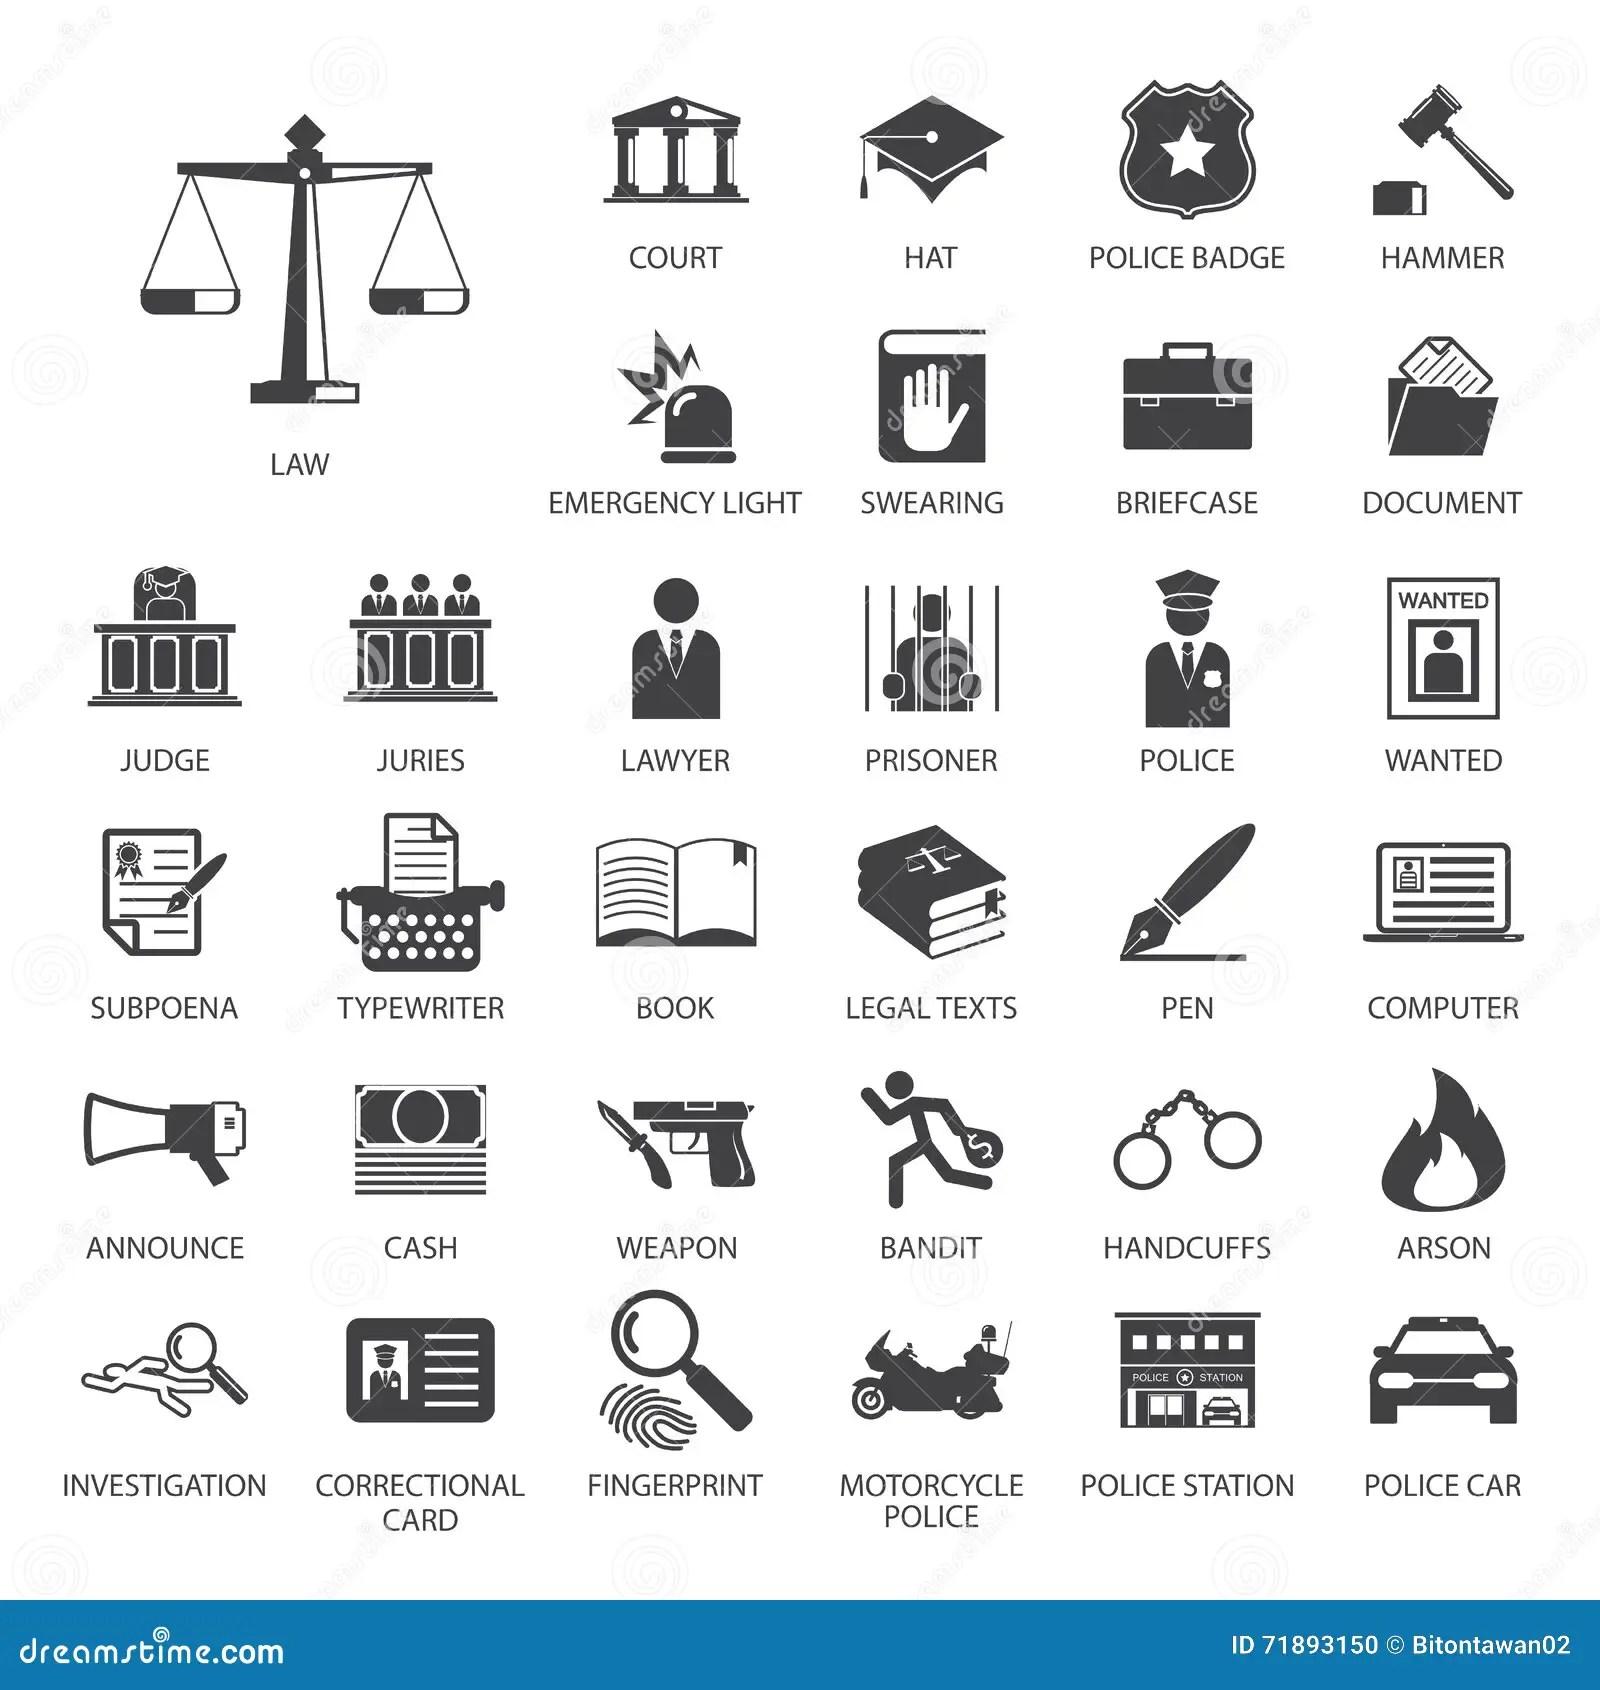 Icon Set Of Police Regimentals, Uniform, Weapons Cartoon